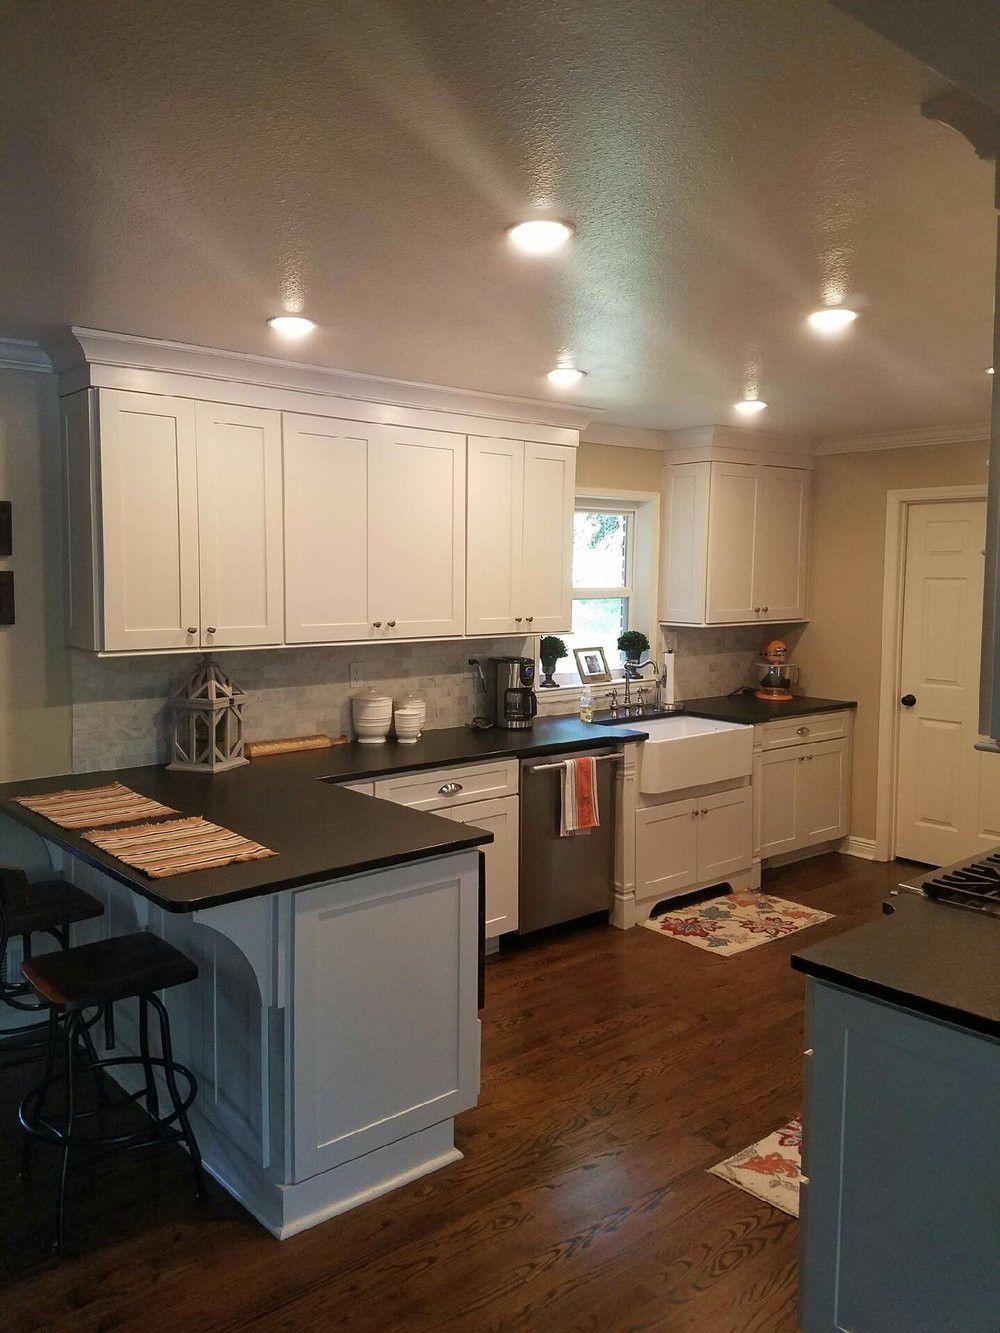 50 Kitchen Cabinets Augusta Ga Apartment Kitchen Cabinet Ideas Check More At Http Www Planetgreenspot Com 201 Kitchen Remodel Kitchen Inspirations Kitchen